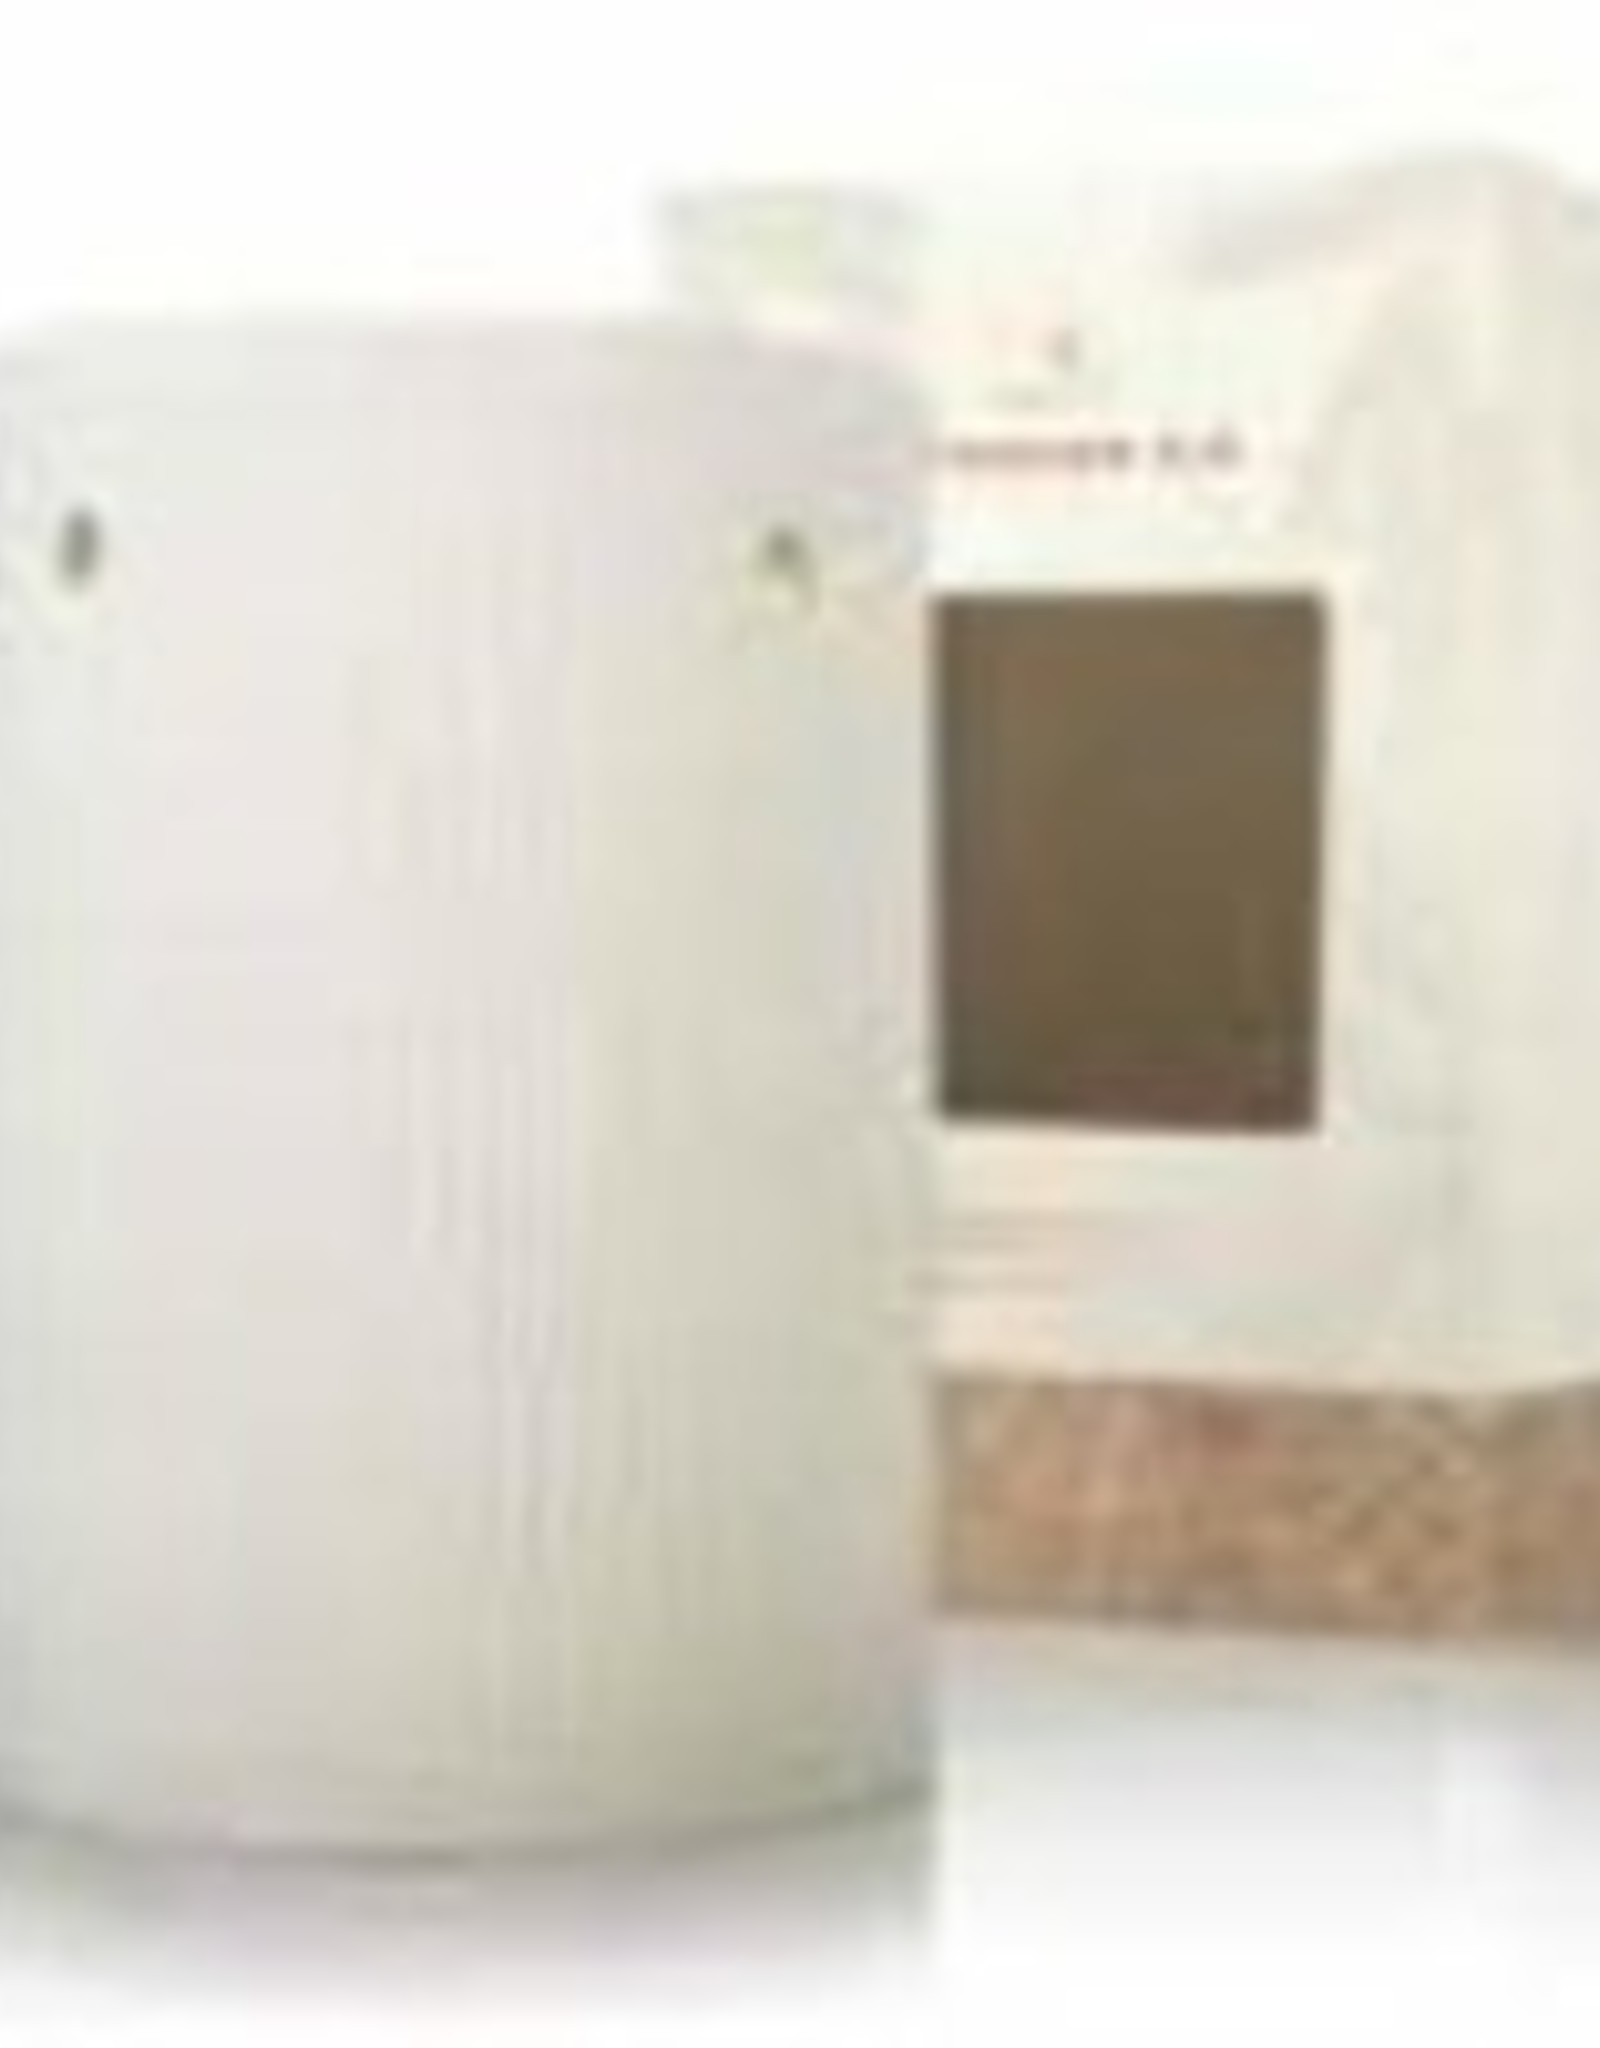 Thymes Frasier Fir Ceramic Wax Warmer